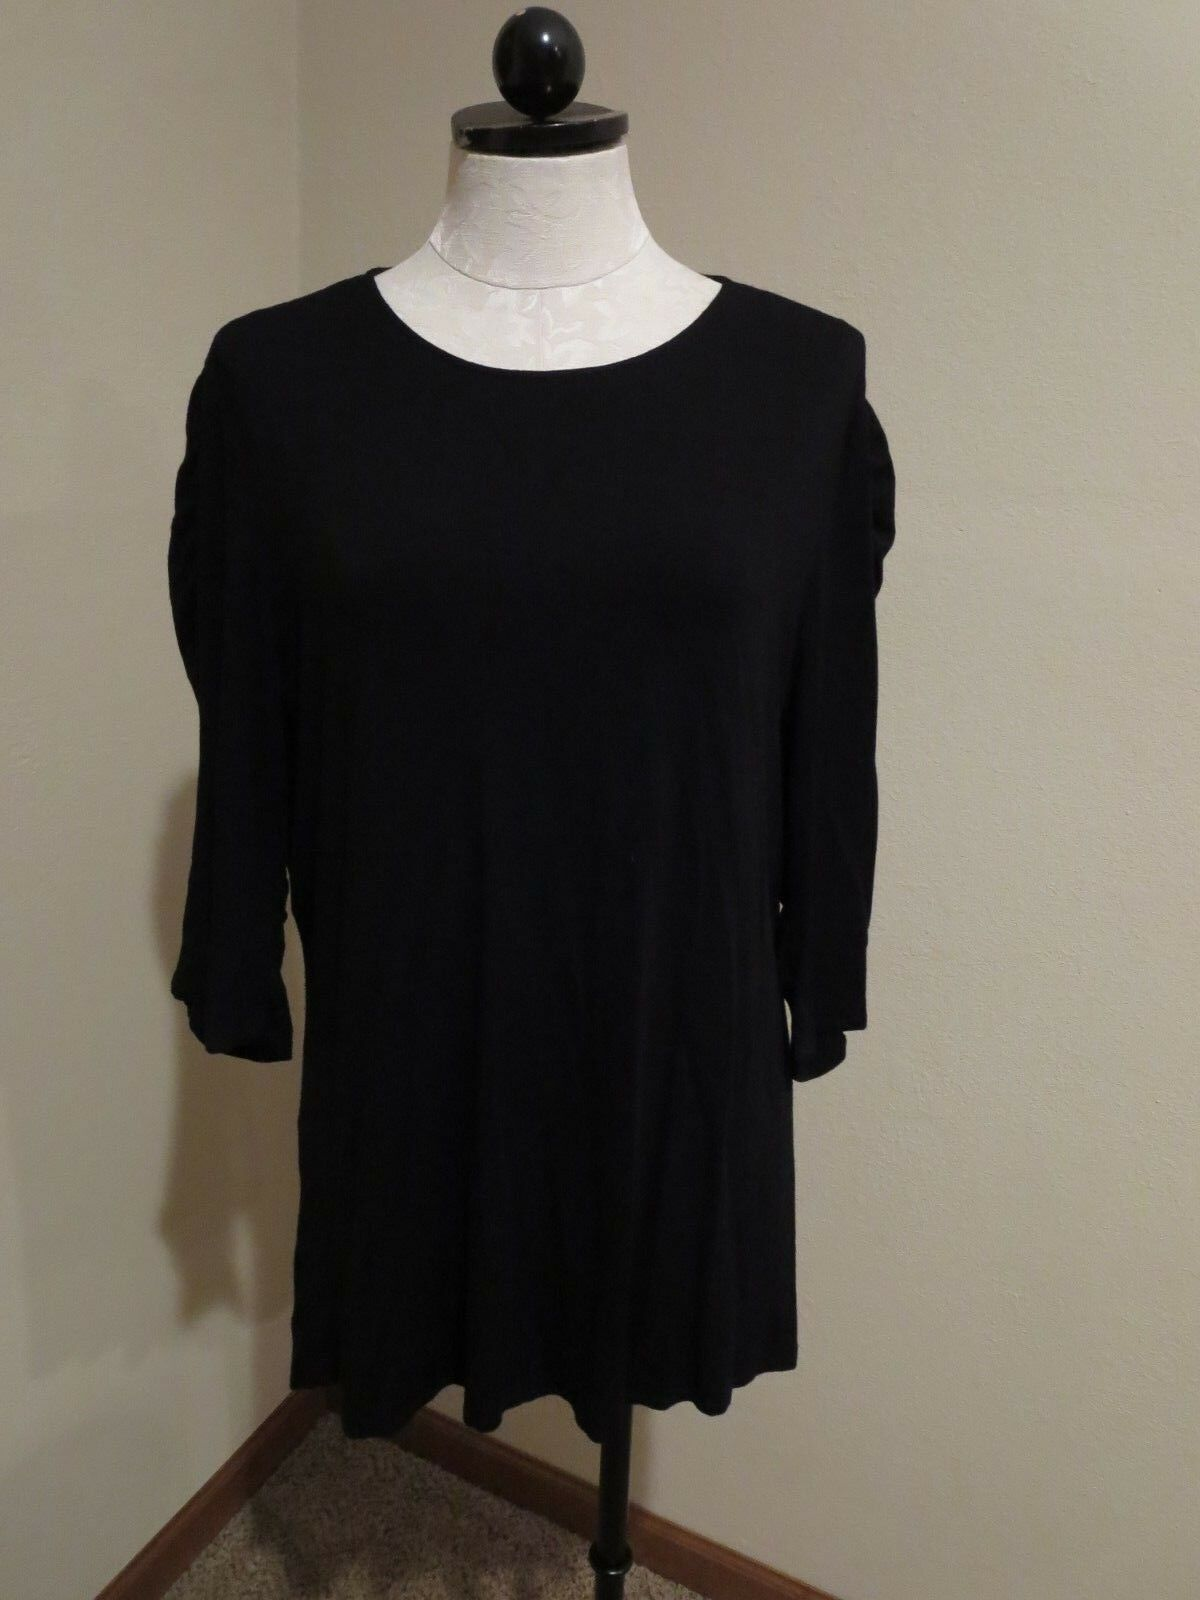 Mieko Mintz schwarz asymmetrical ruched sleeve tunic top shirt sz 4